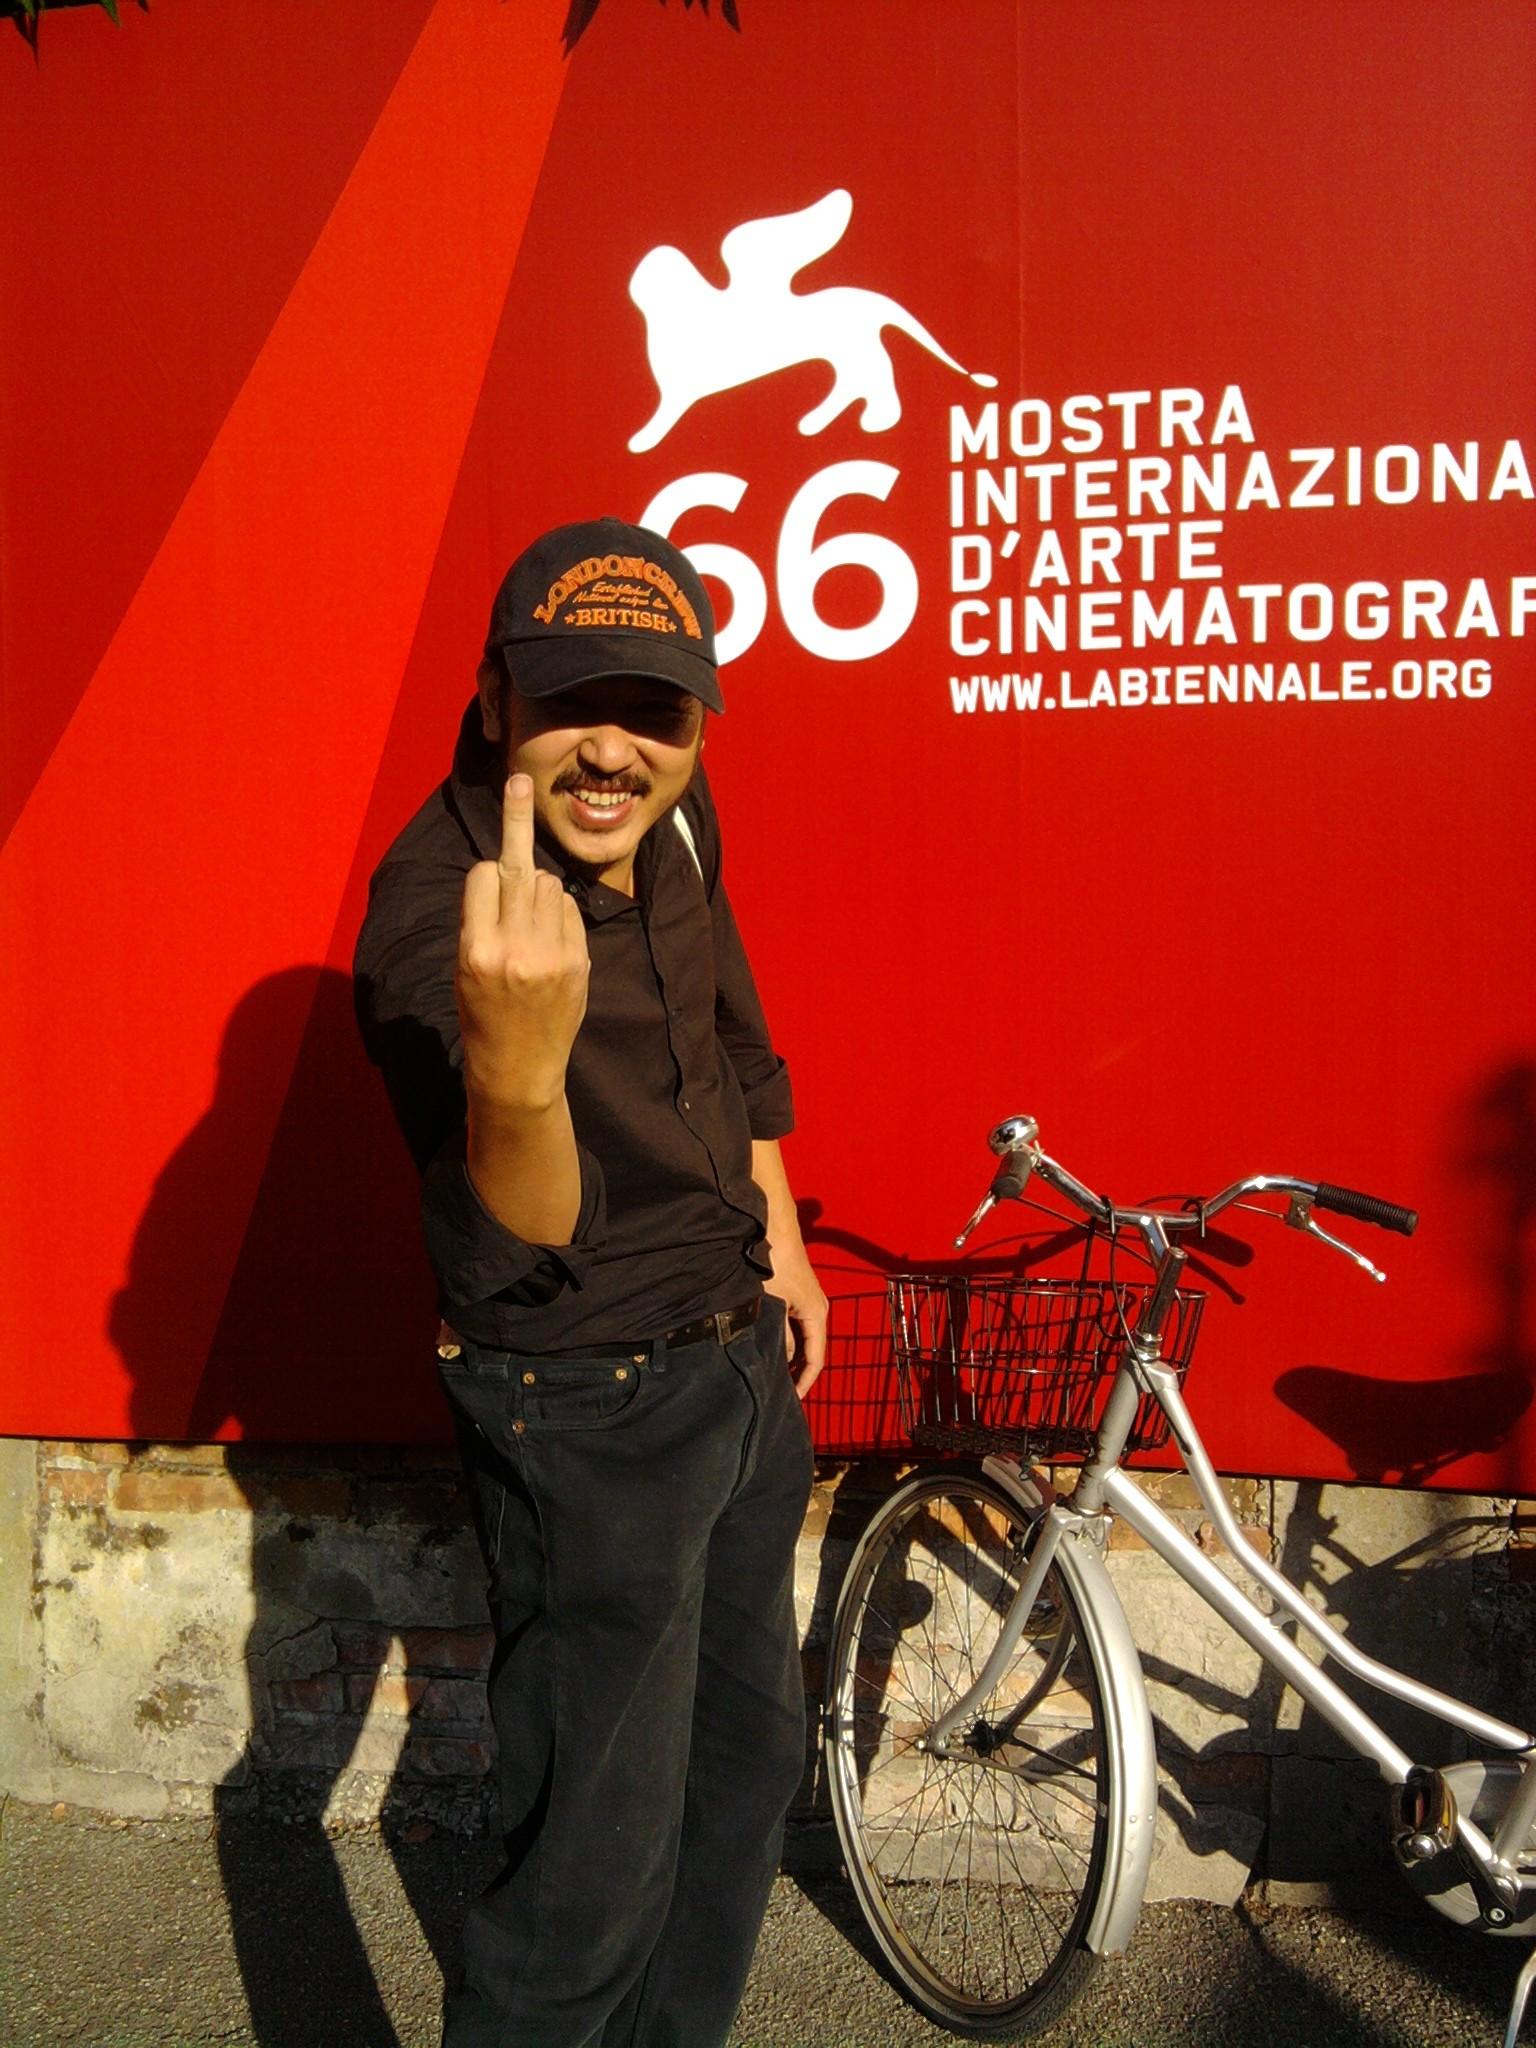 The Fucking Film ! Bui Thac Chuyen (Director) - Venice Festival. ©Arnaud Soulier